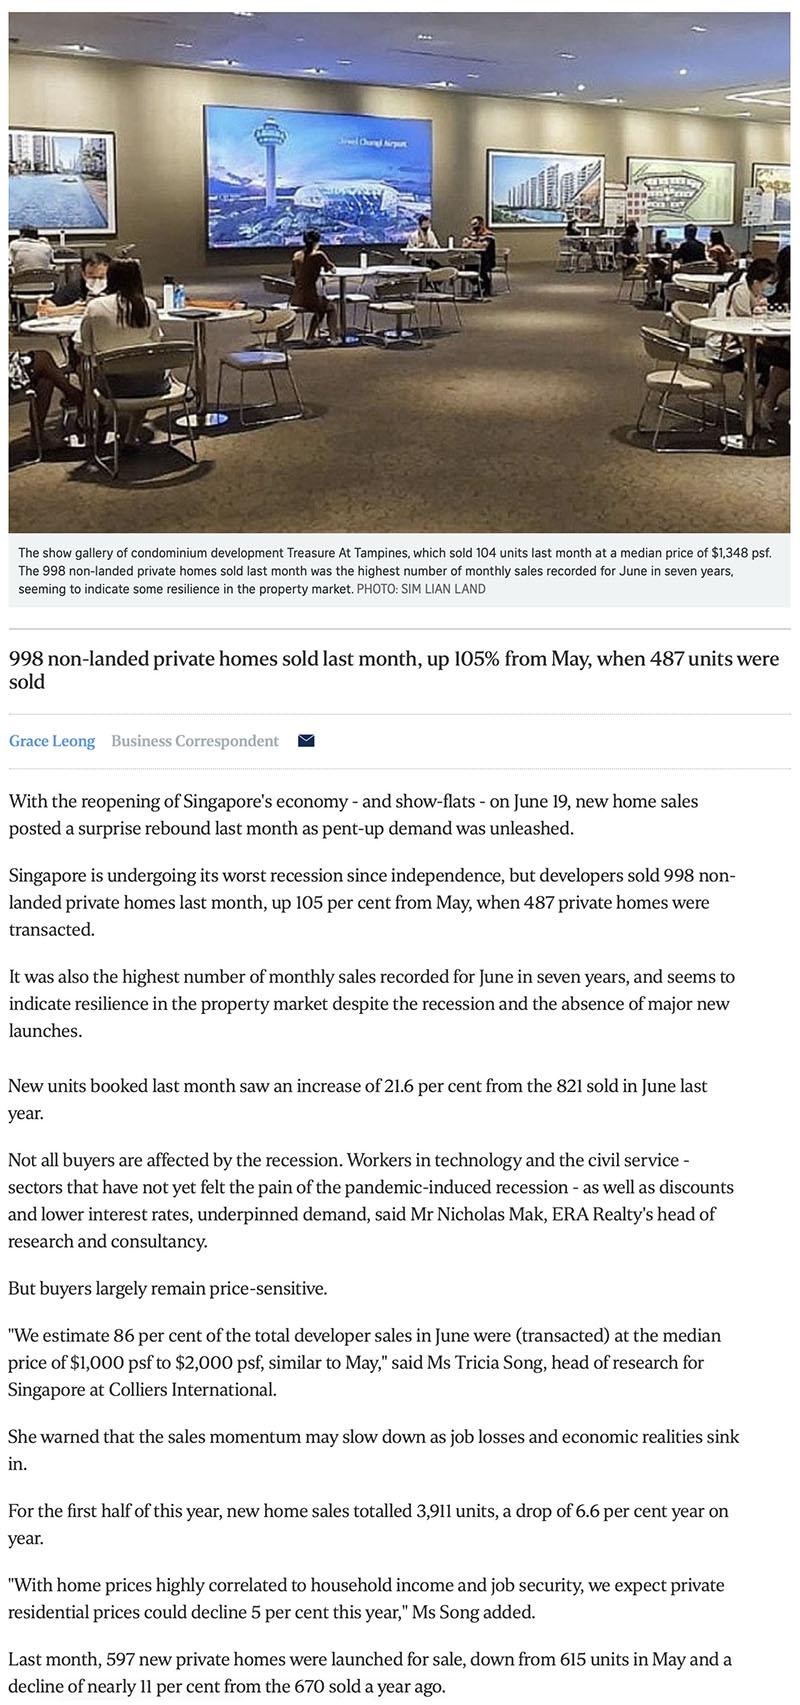 Pefect Ten - New private home sales post surprise rebound -1